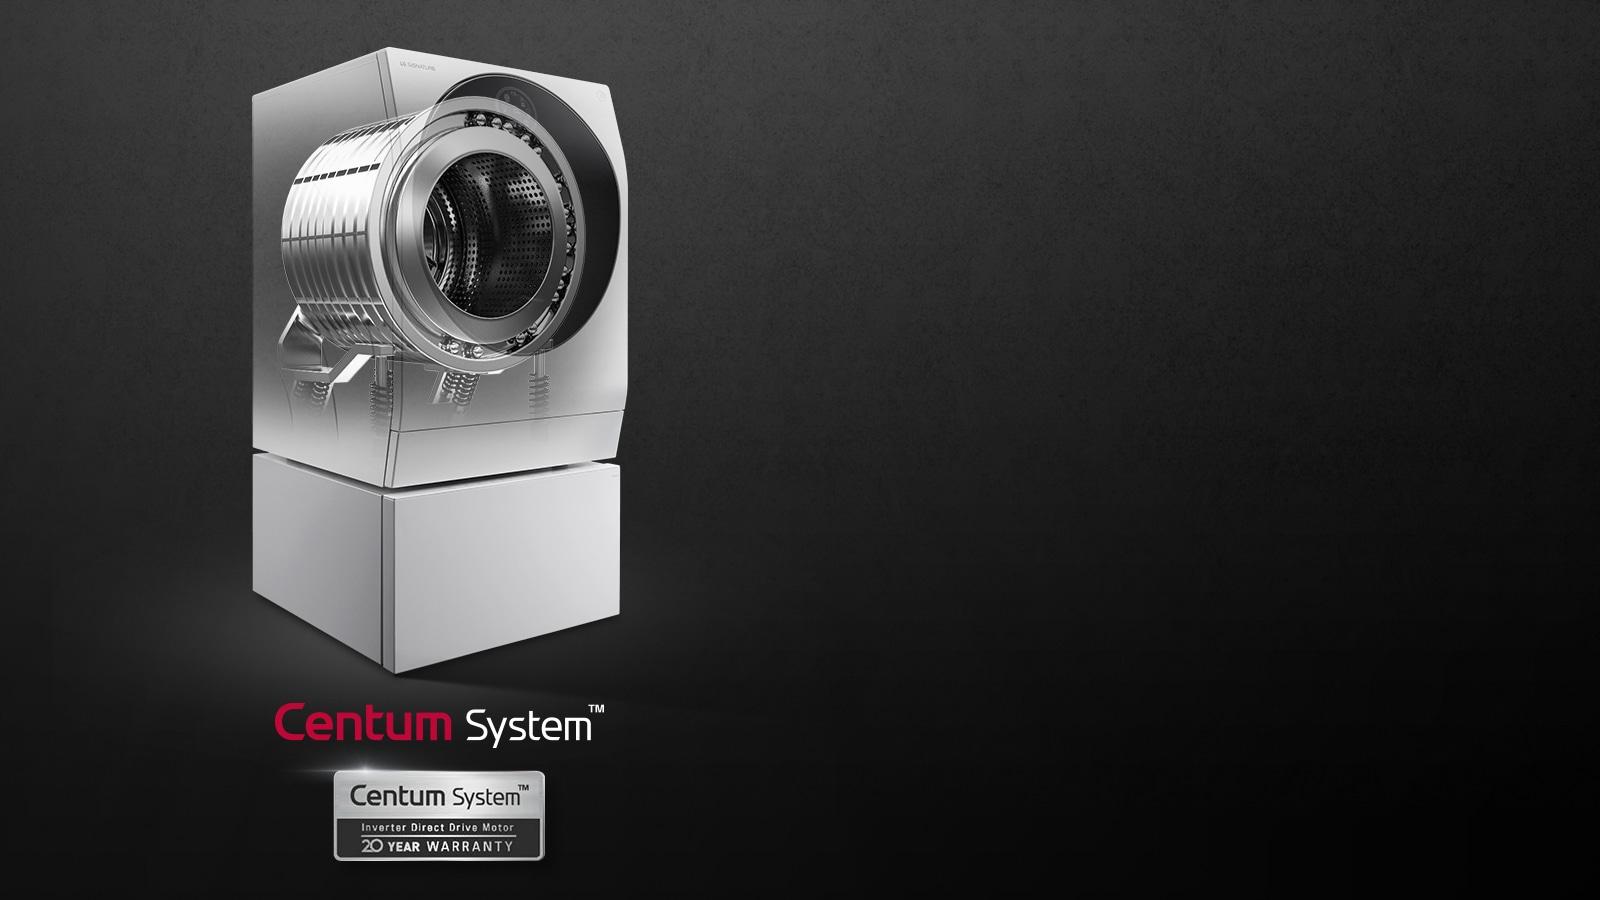 ™Centum System، انتخابی هوشمند تا 20 سال دیگر<br>1